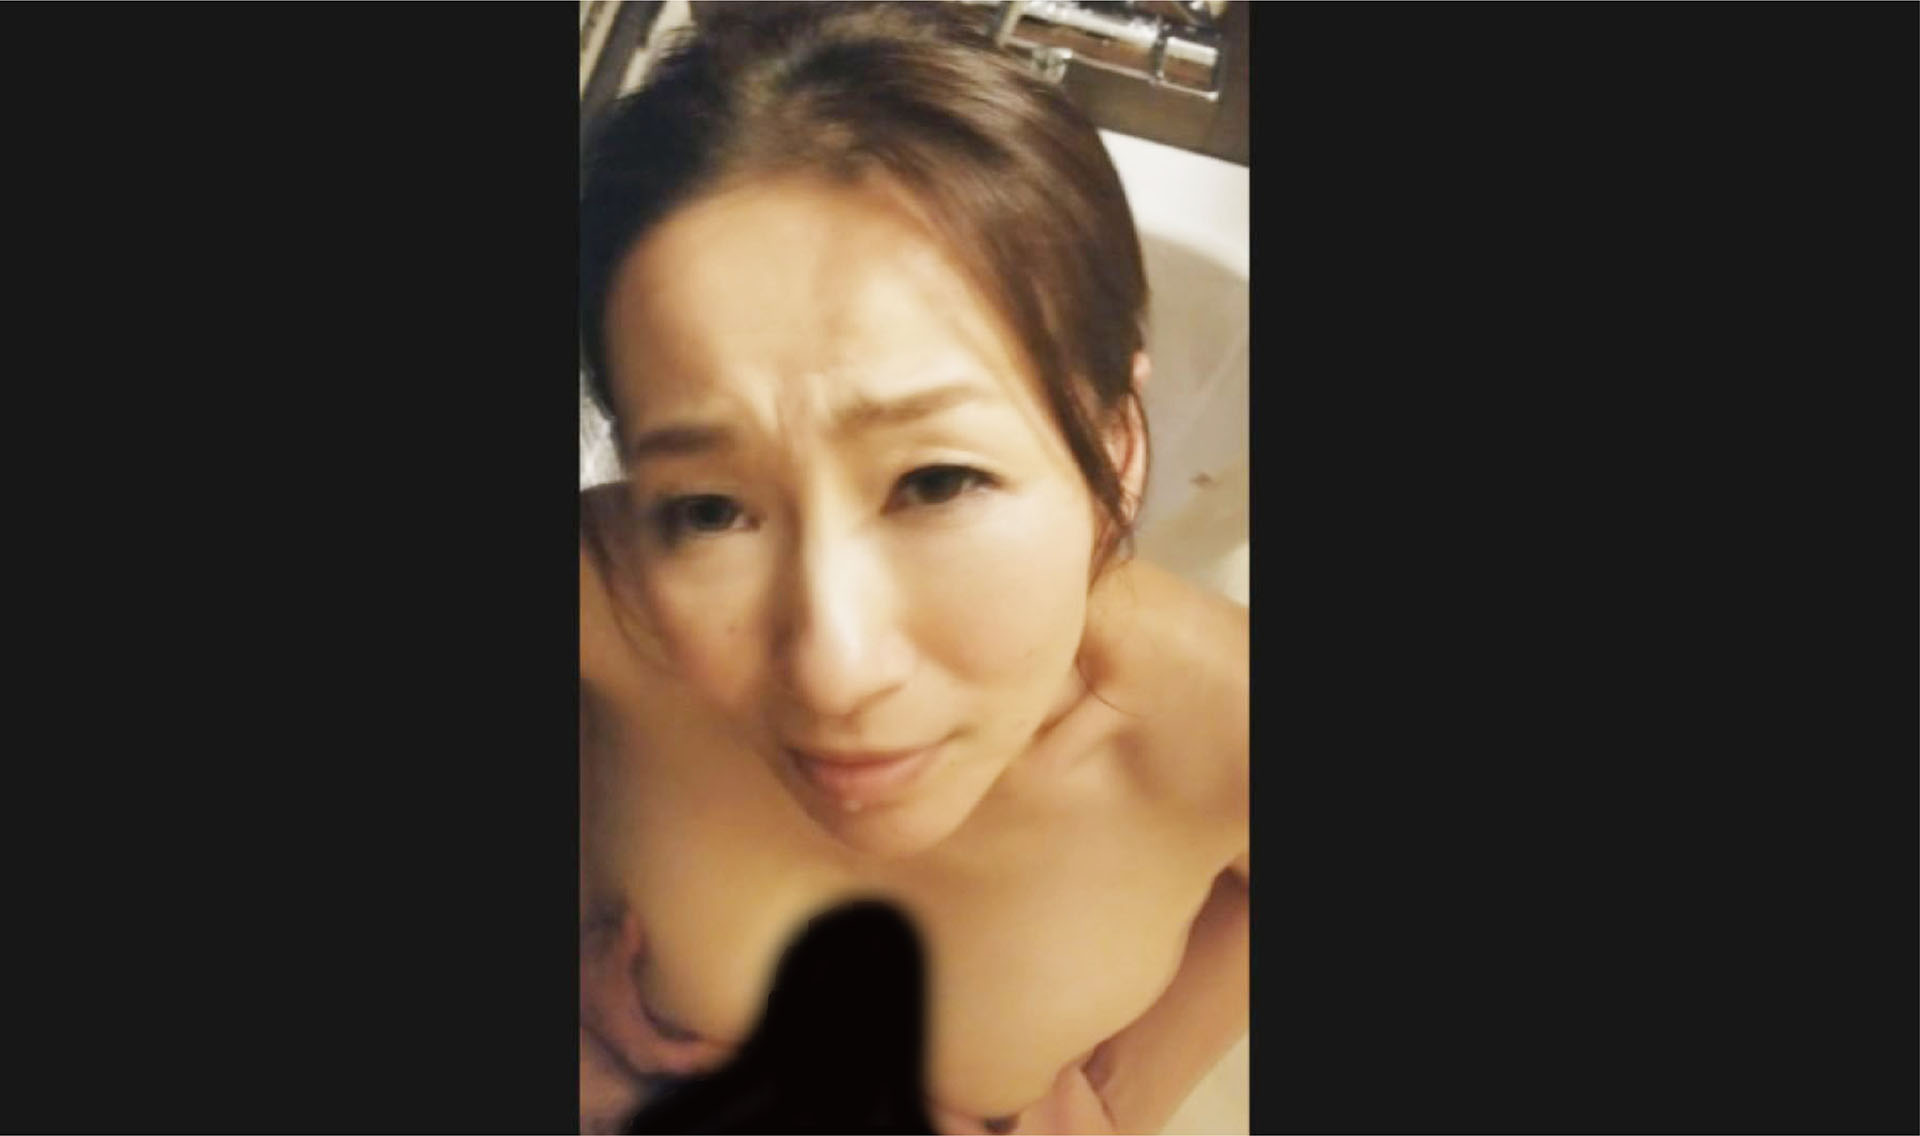 東京素人巨乳原石採掘倶楽部 vol.4 佳代(G)のサンプル画像2